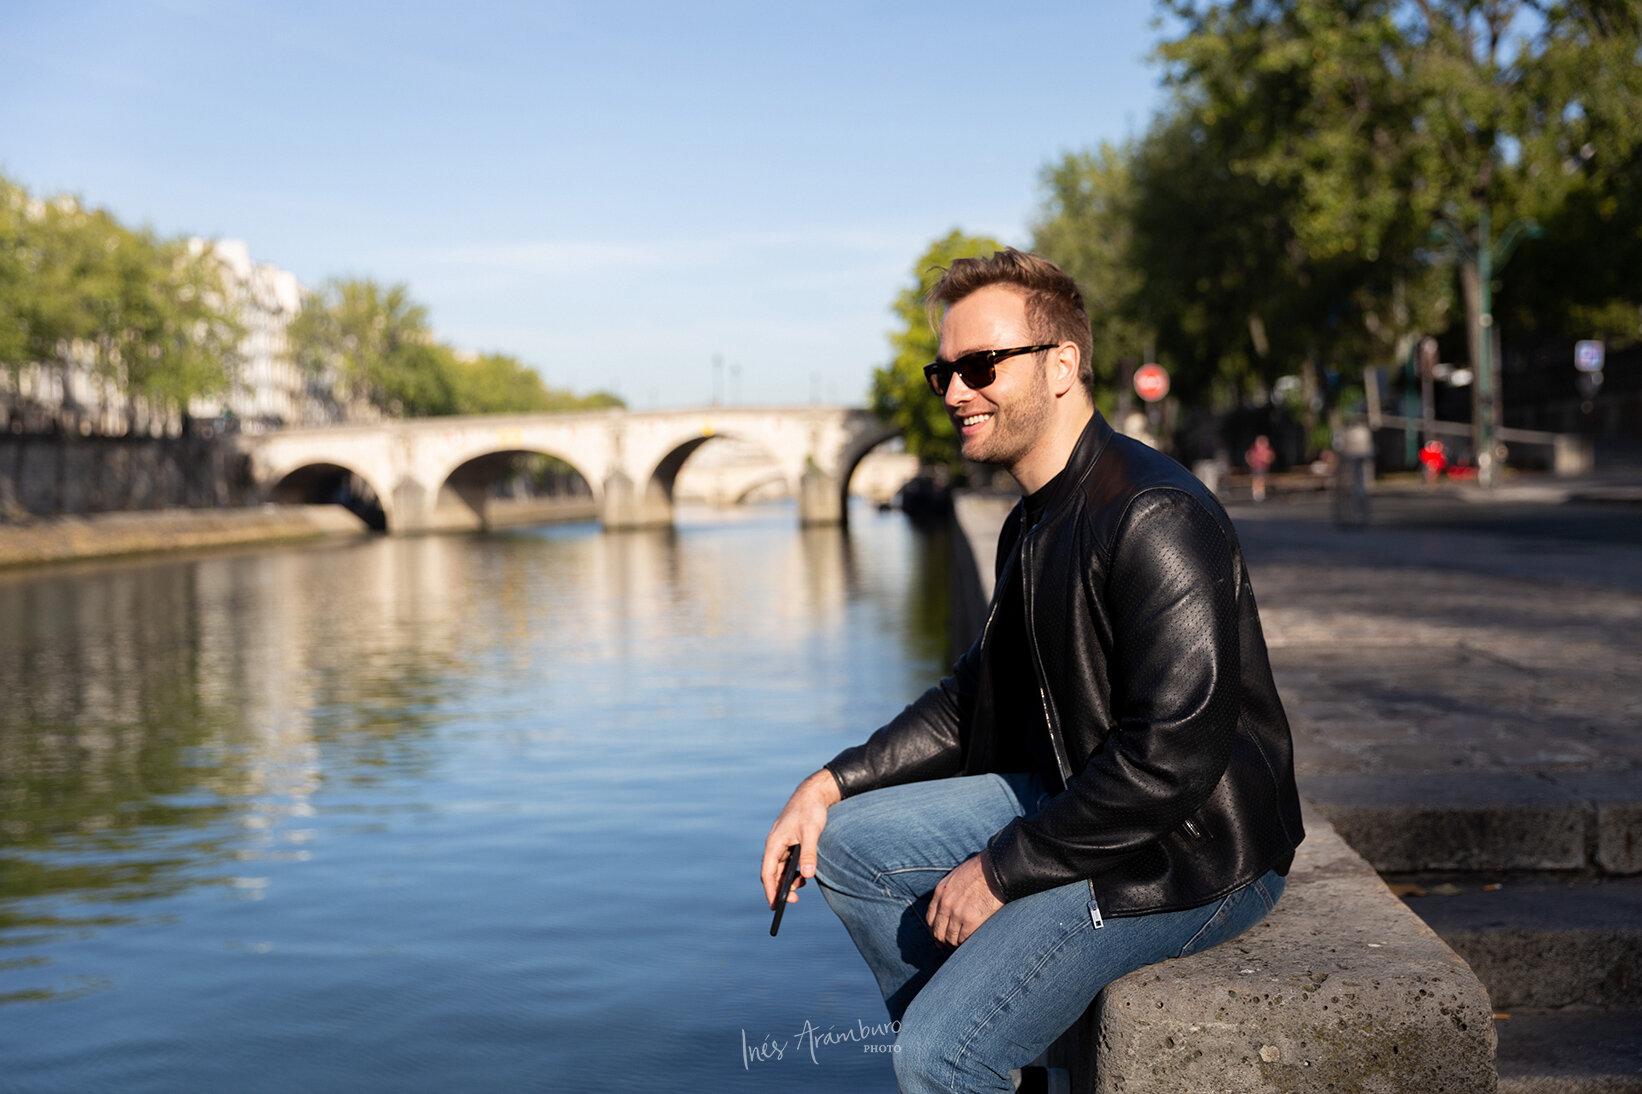 Ines-Aramburo-photographe-paris-corporate-lifestyle-photographer3.jpg